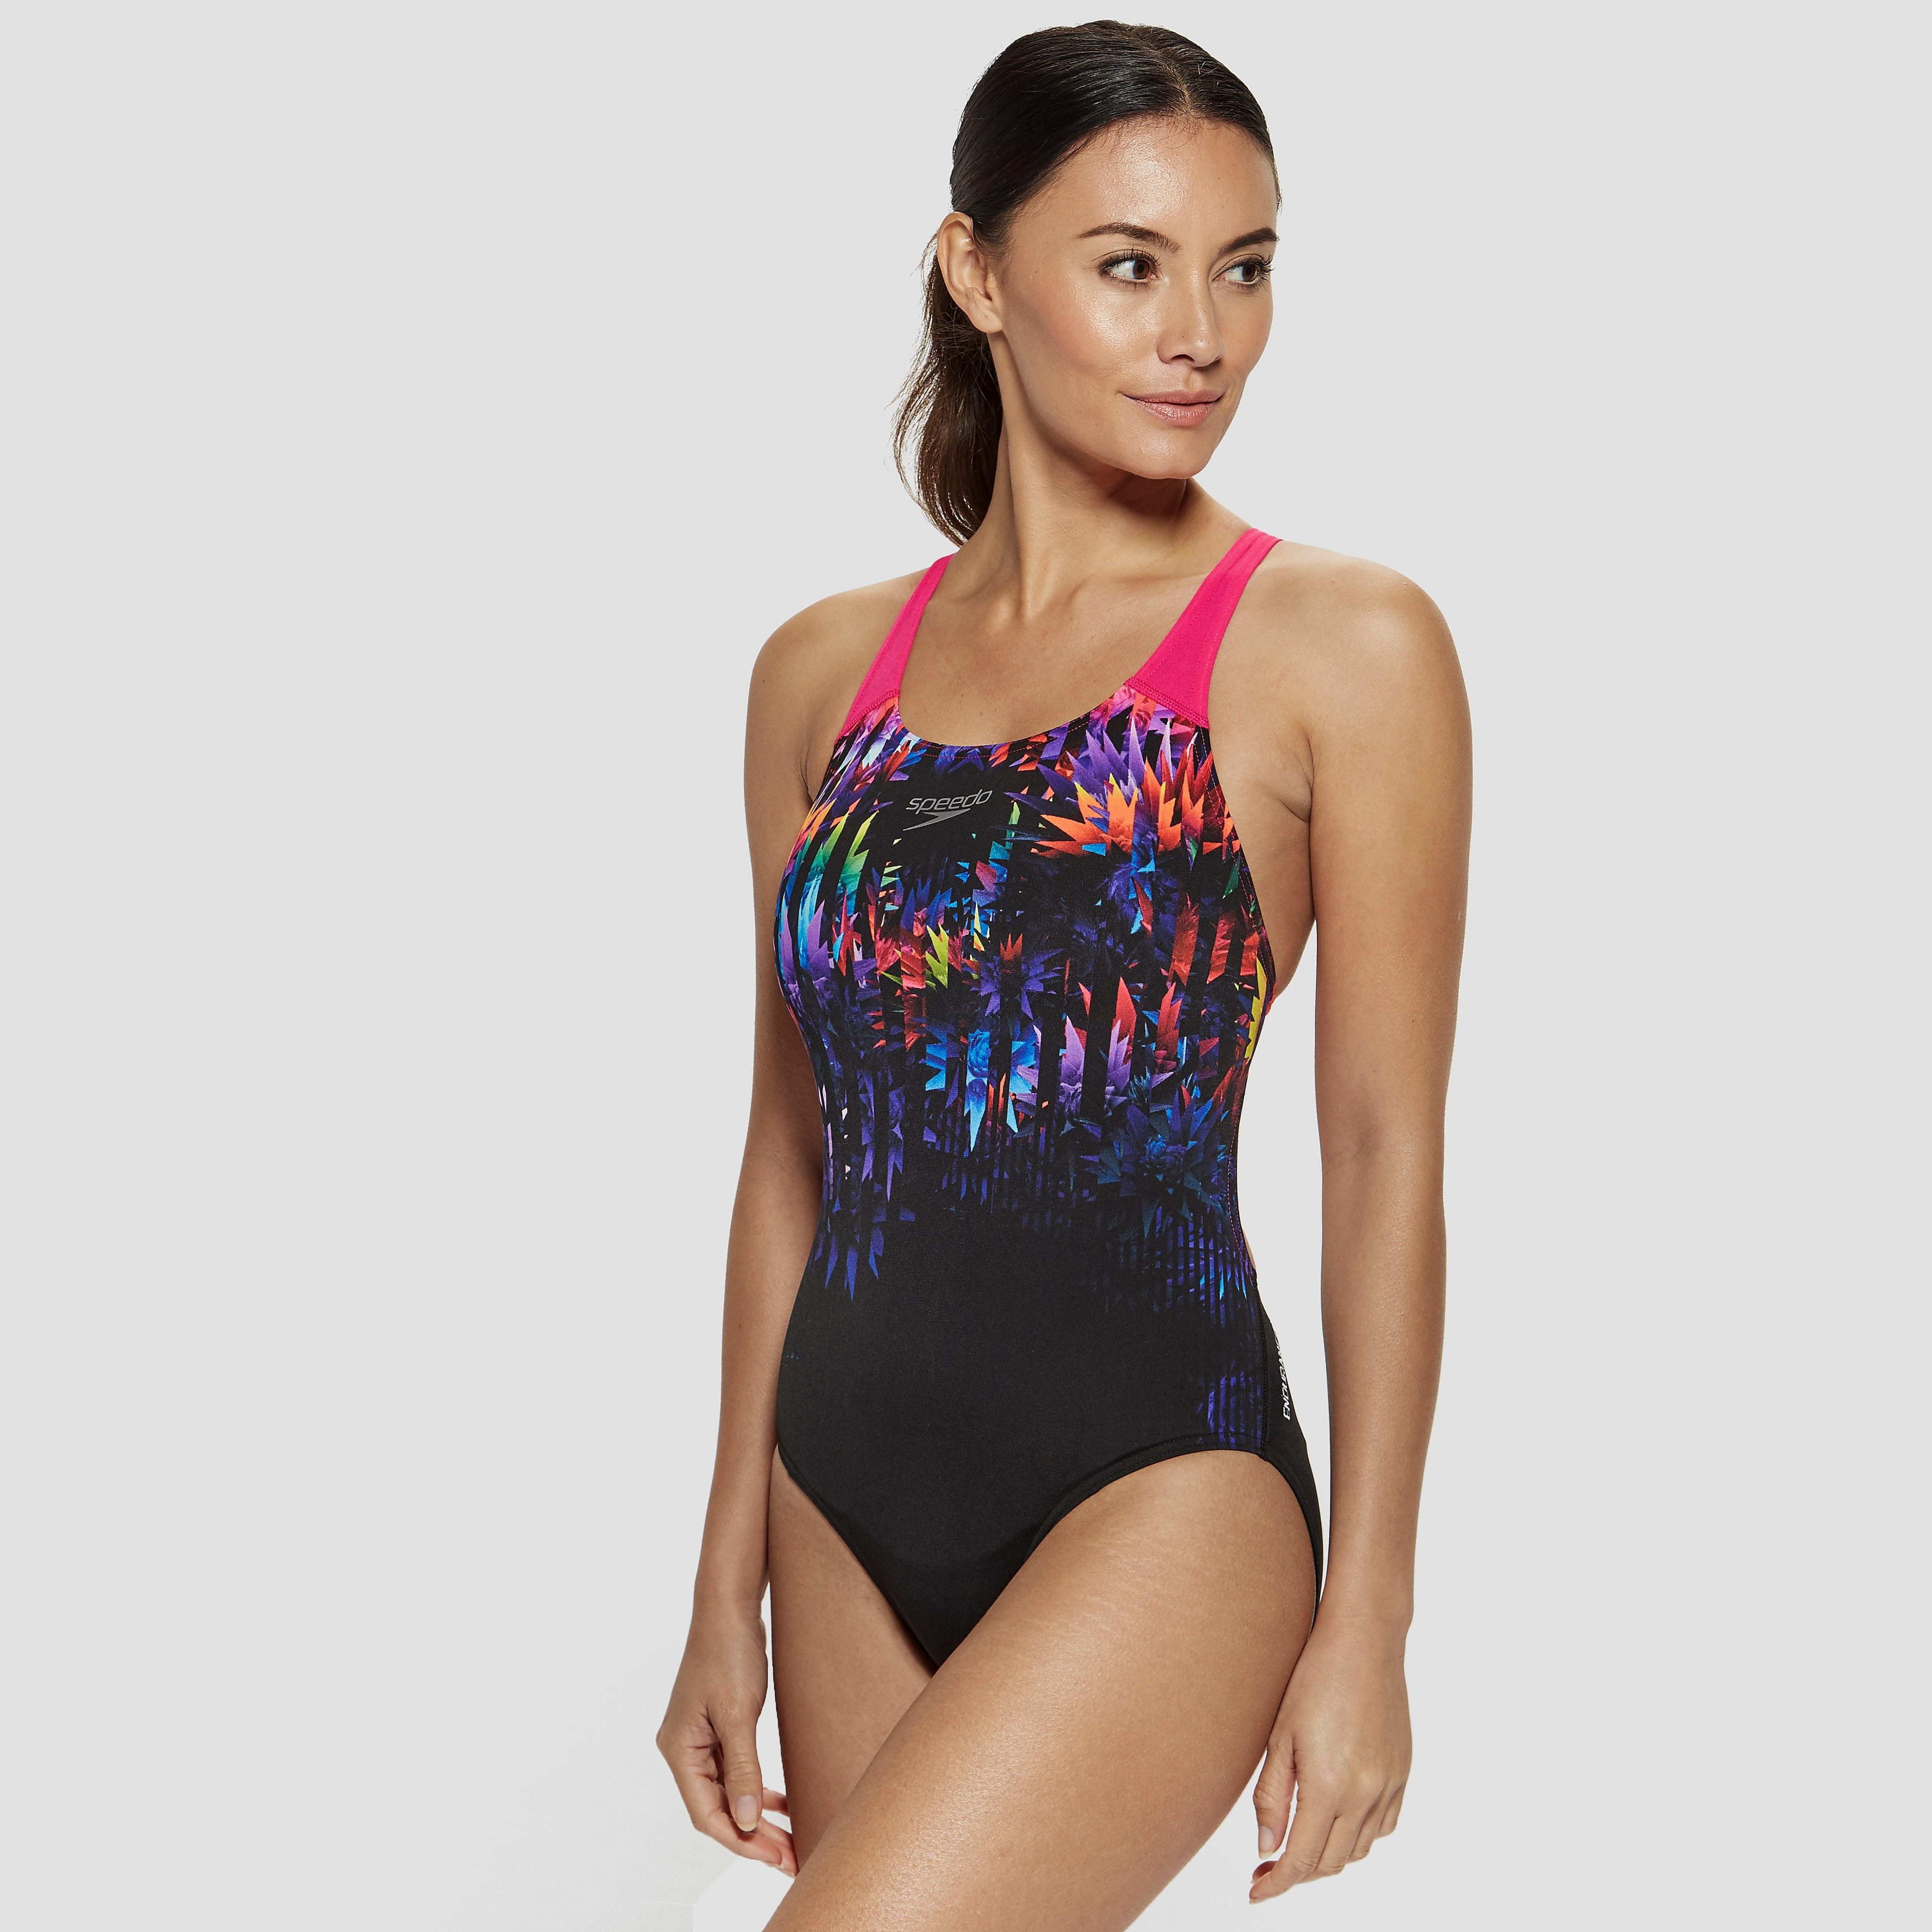 Speedo Solar Fizz Digital Powerback Swimsuit